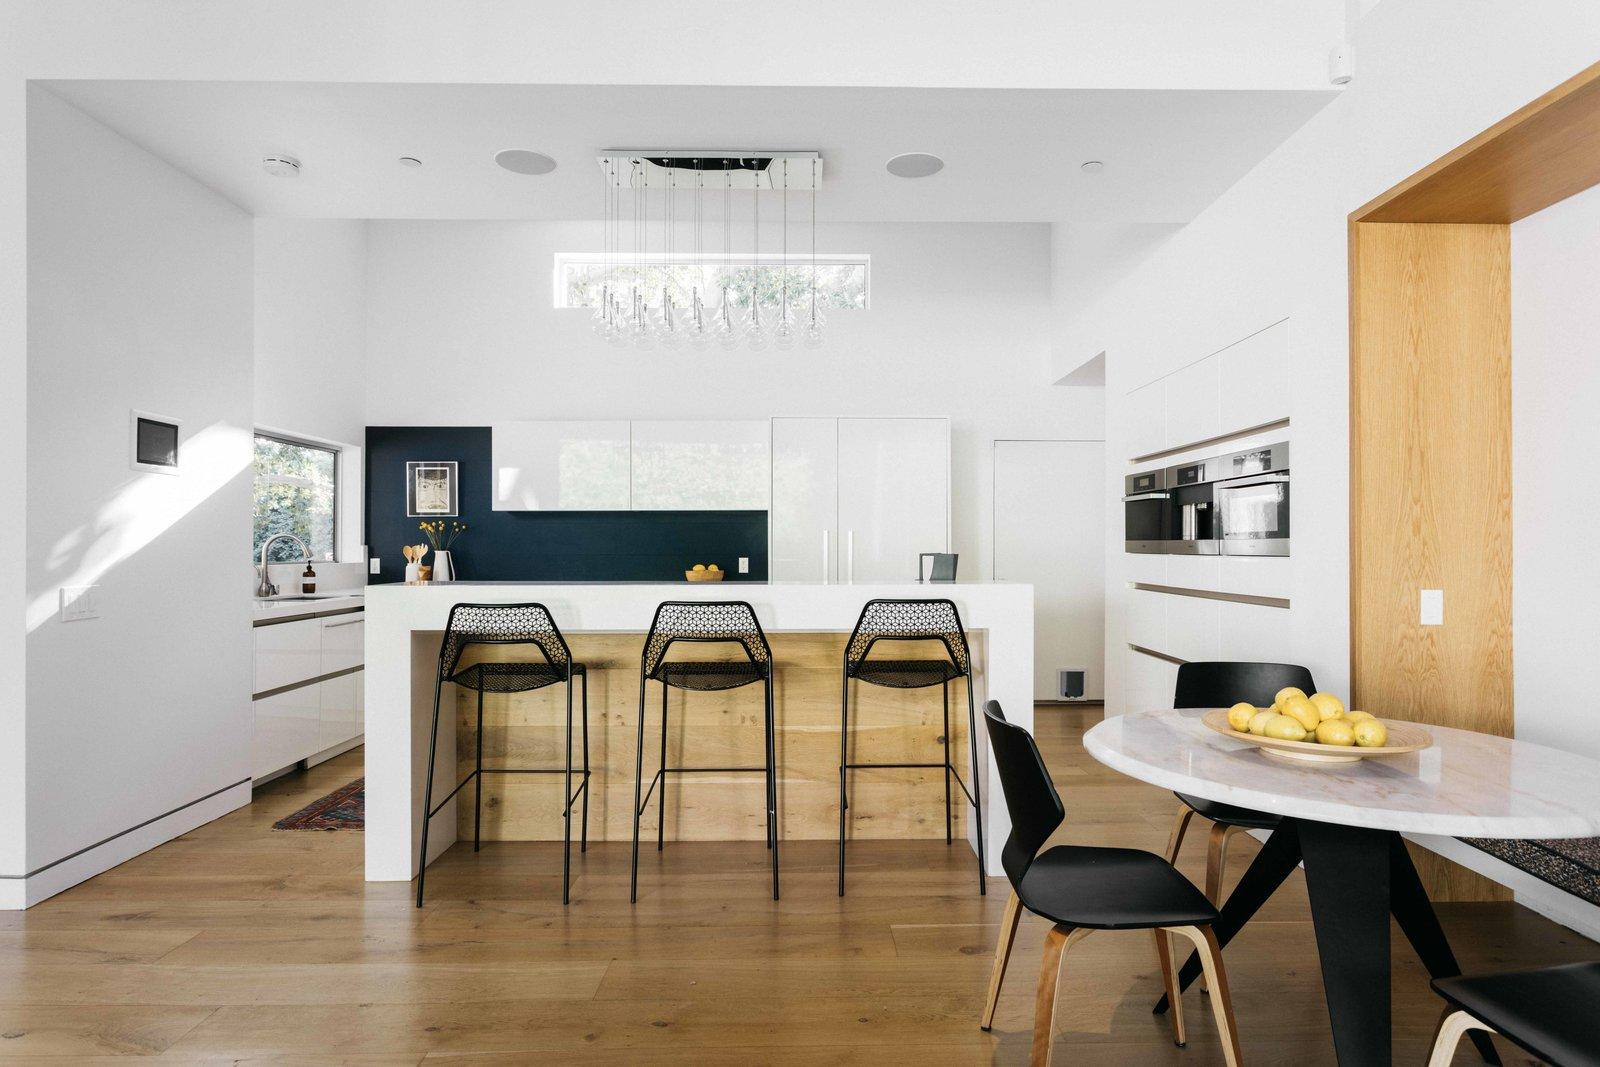 Bruno Bondanelli Los Angeles home kitchen